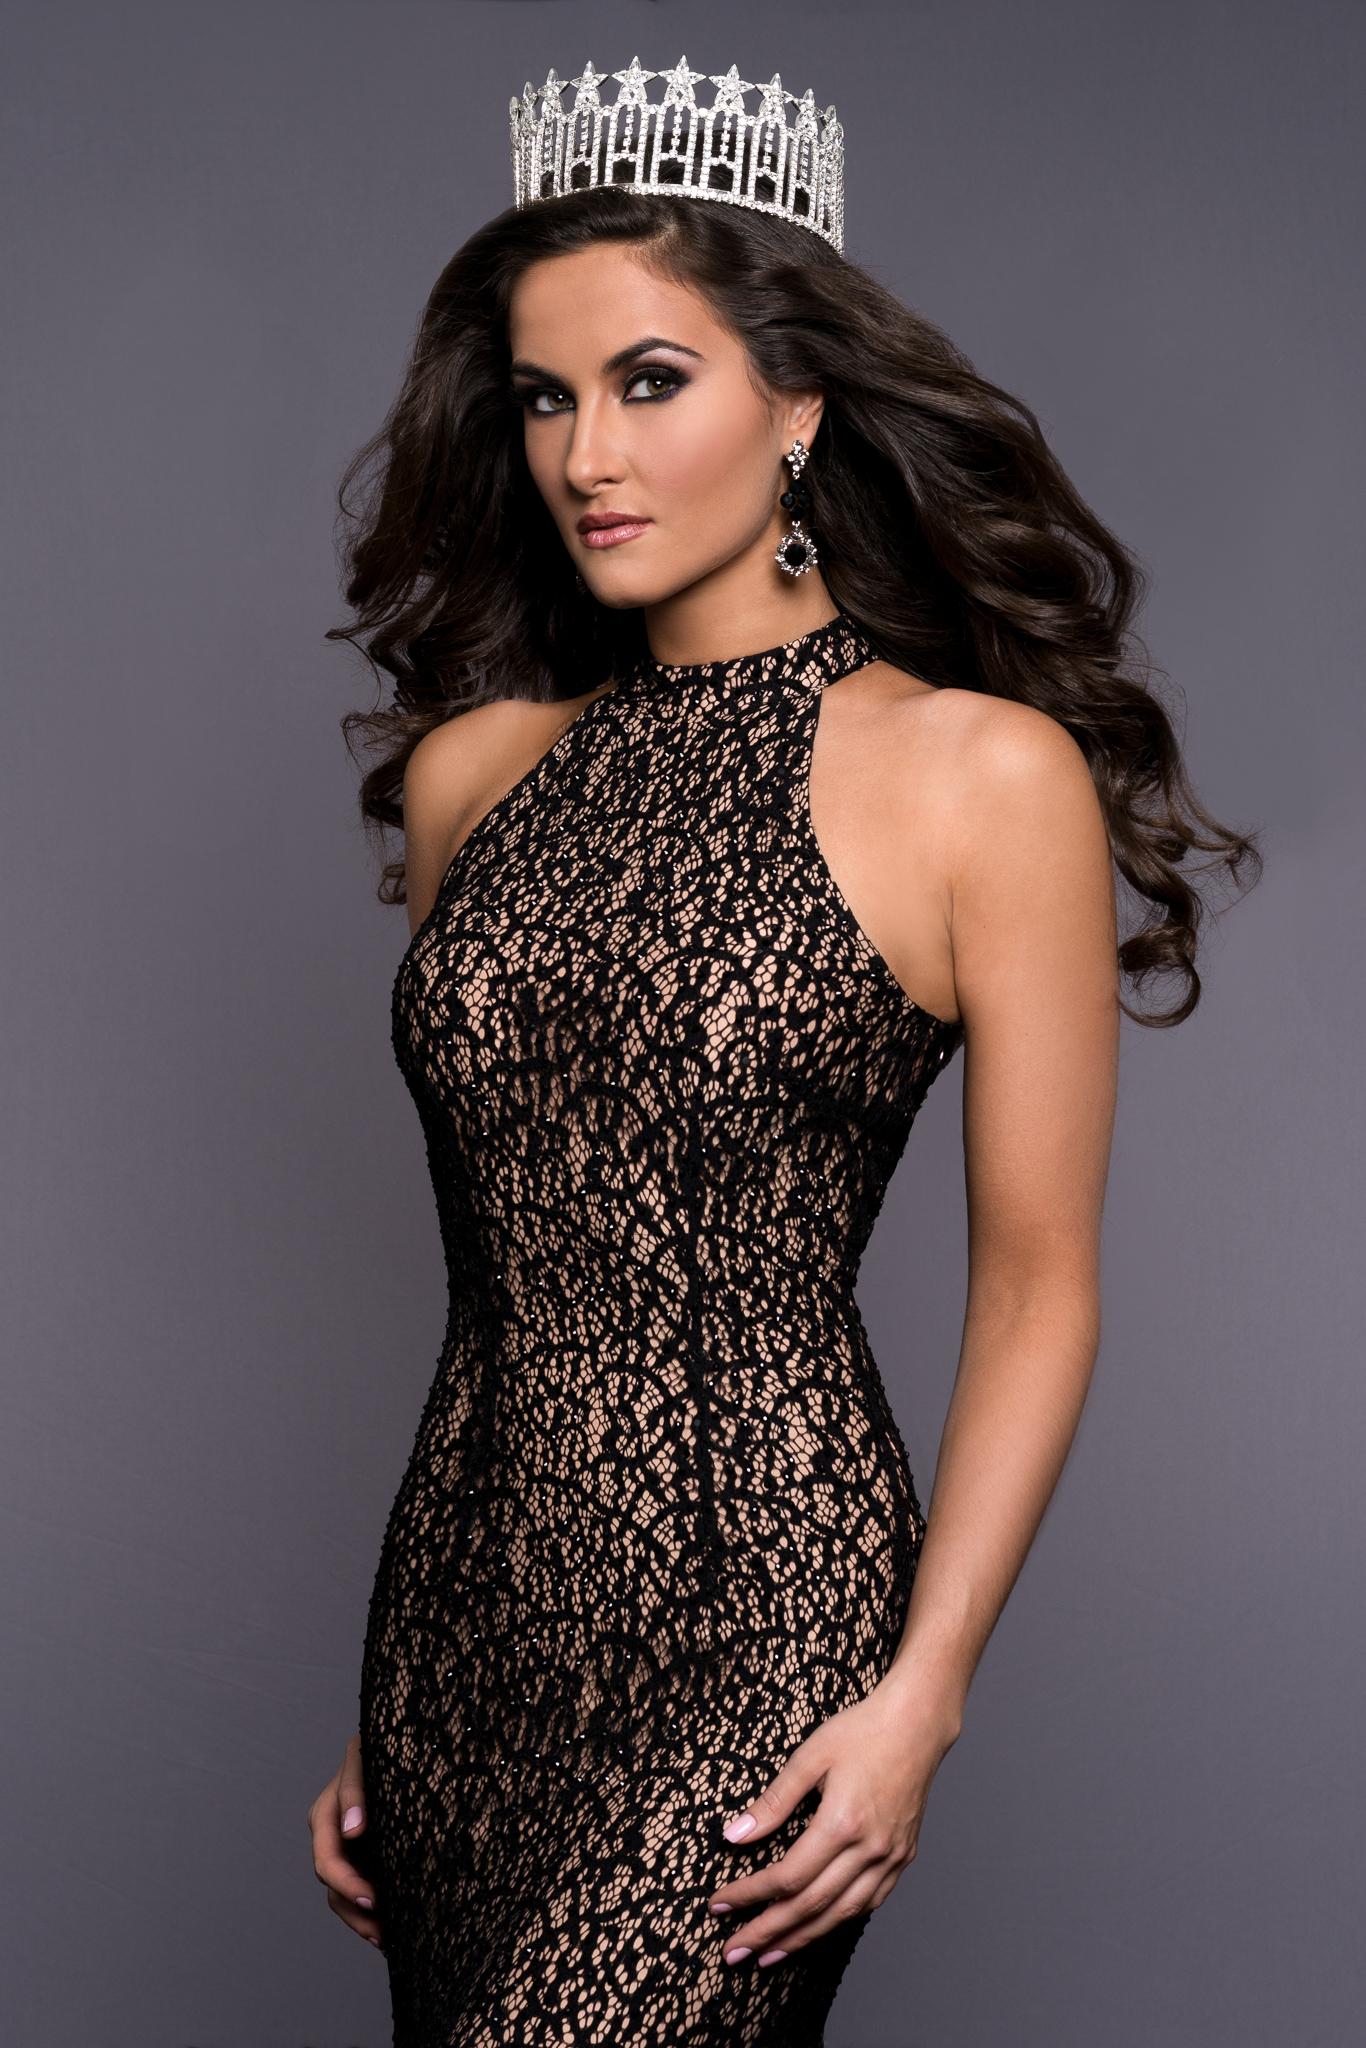 Miss New York USA 2016